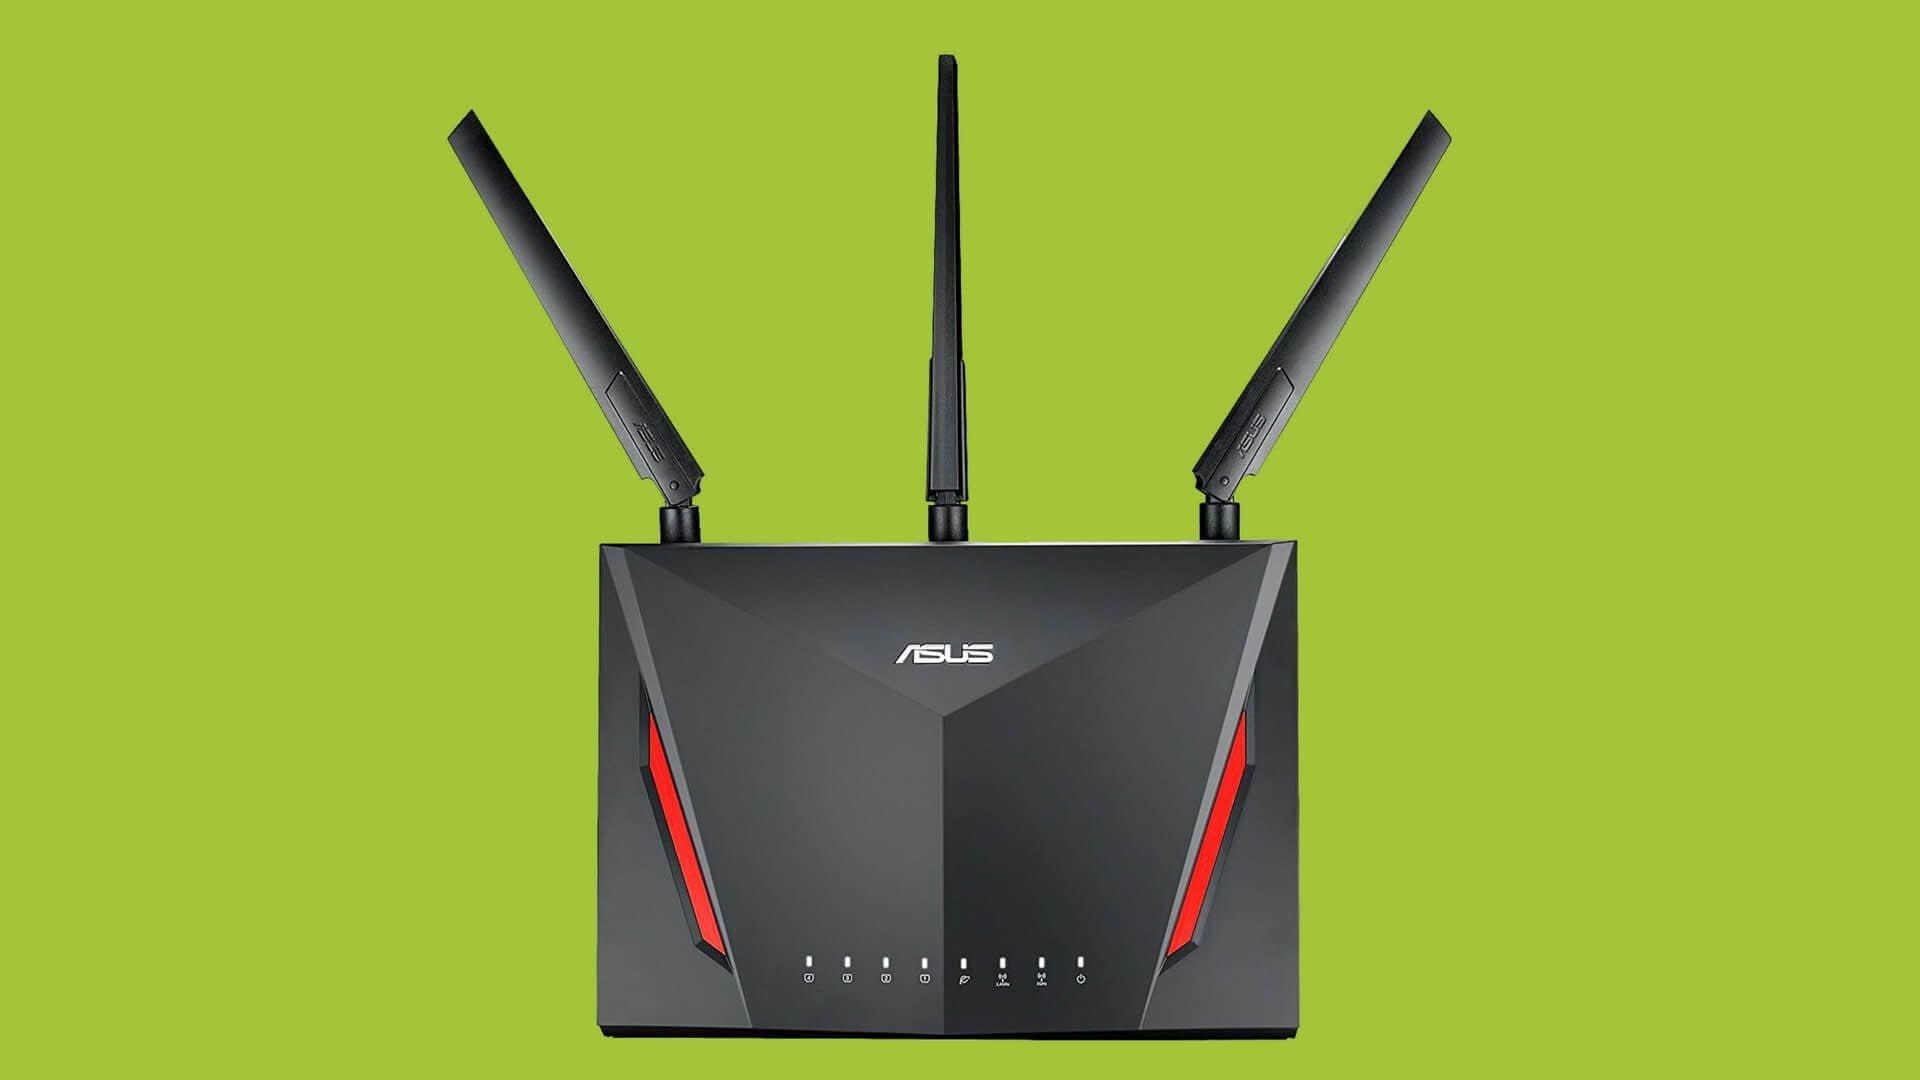 Asus RT-AC86U Test - meine VPN-Router Empfehlung 41 techboys.de • smarte News, auf den Punkt! Asus RT-AC86U Test - meine VPN-Router Empfehlung